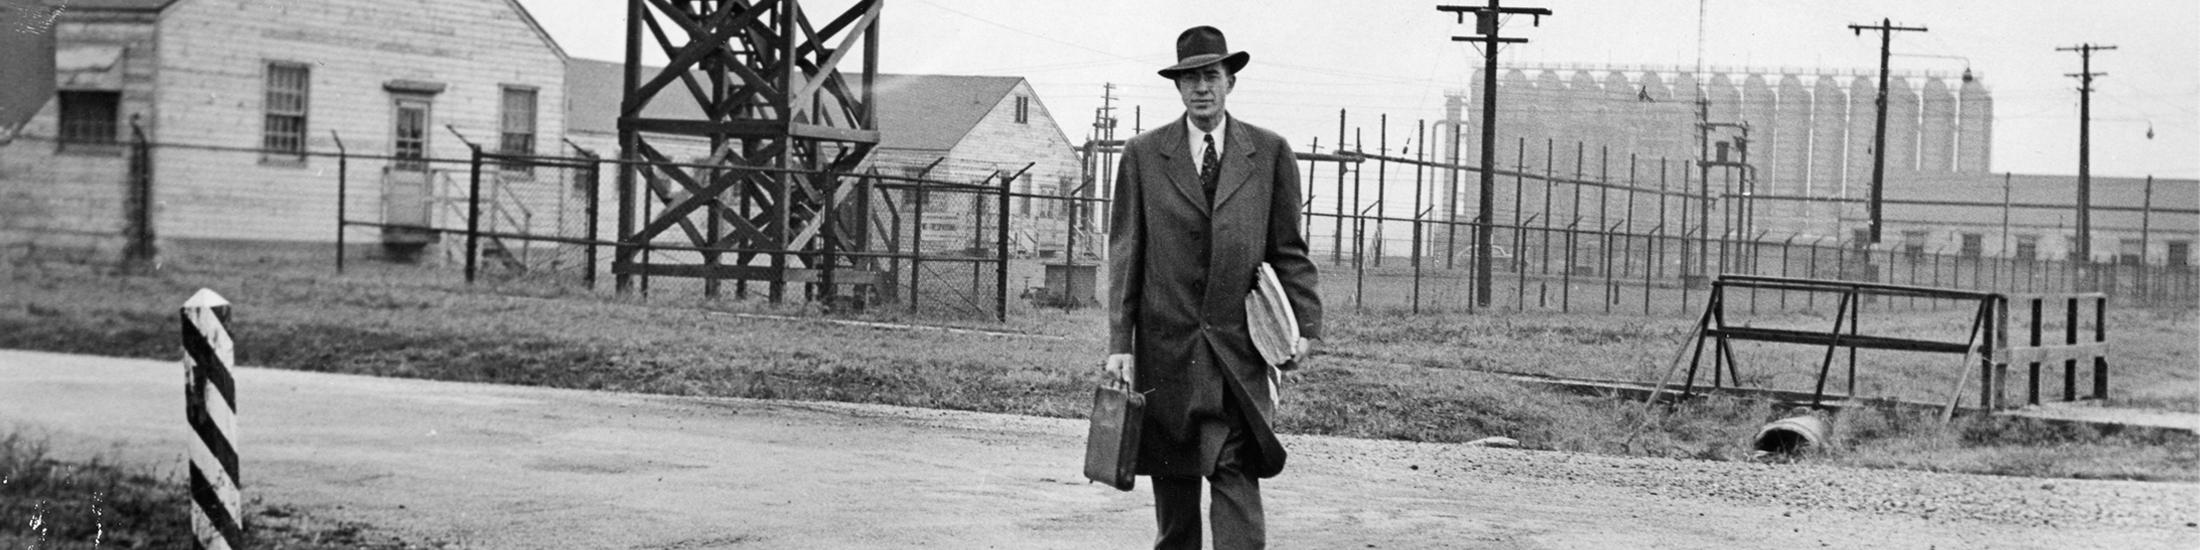 Last man leaving the war plant, 1947